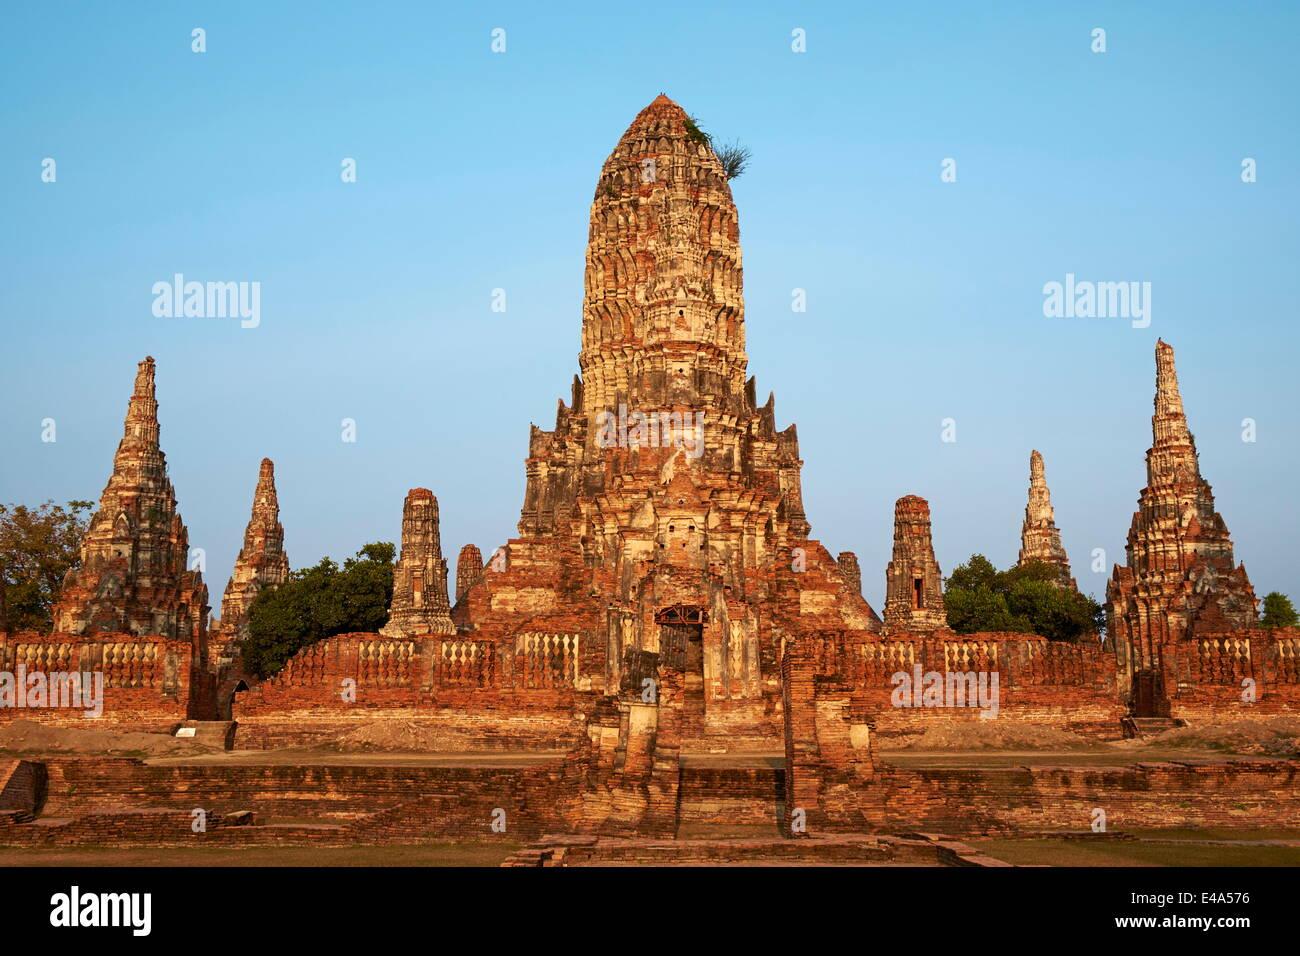 Wat Chai Wattanaram, Ayutthaya Historical Park, UNESCO World Heritage Site, Ayutthaya, Thailand, Southeast Asia, - Stock Image